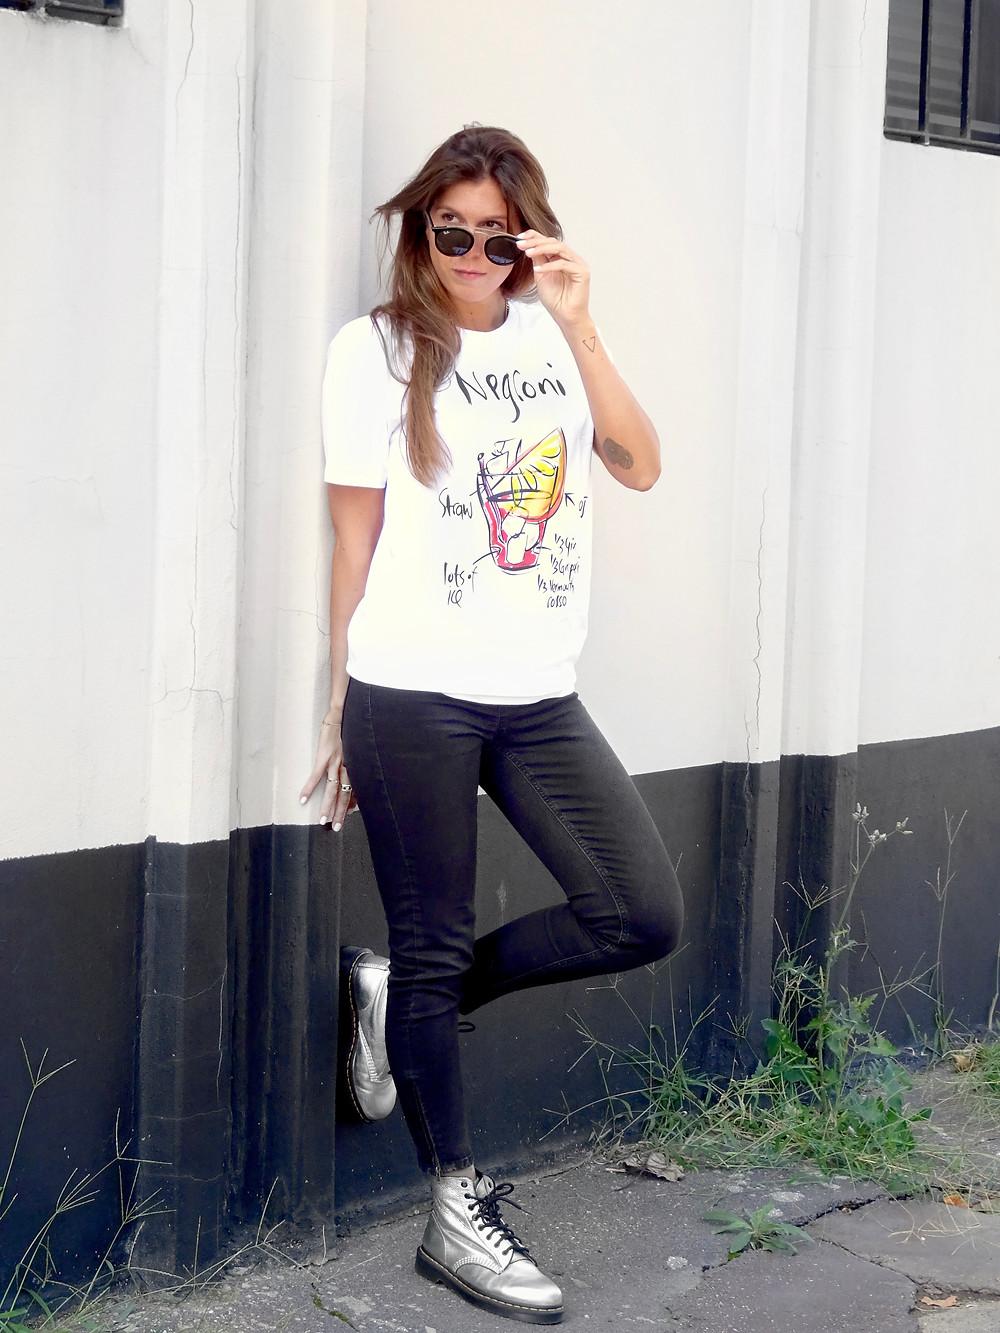 t-shirt con scritte cocktail Negroni